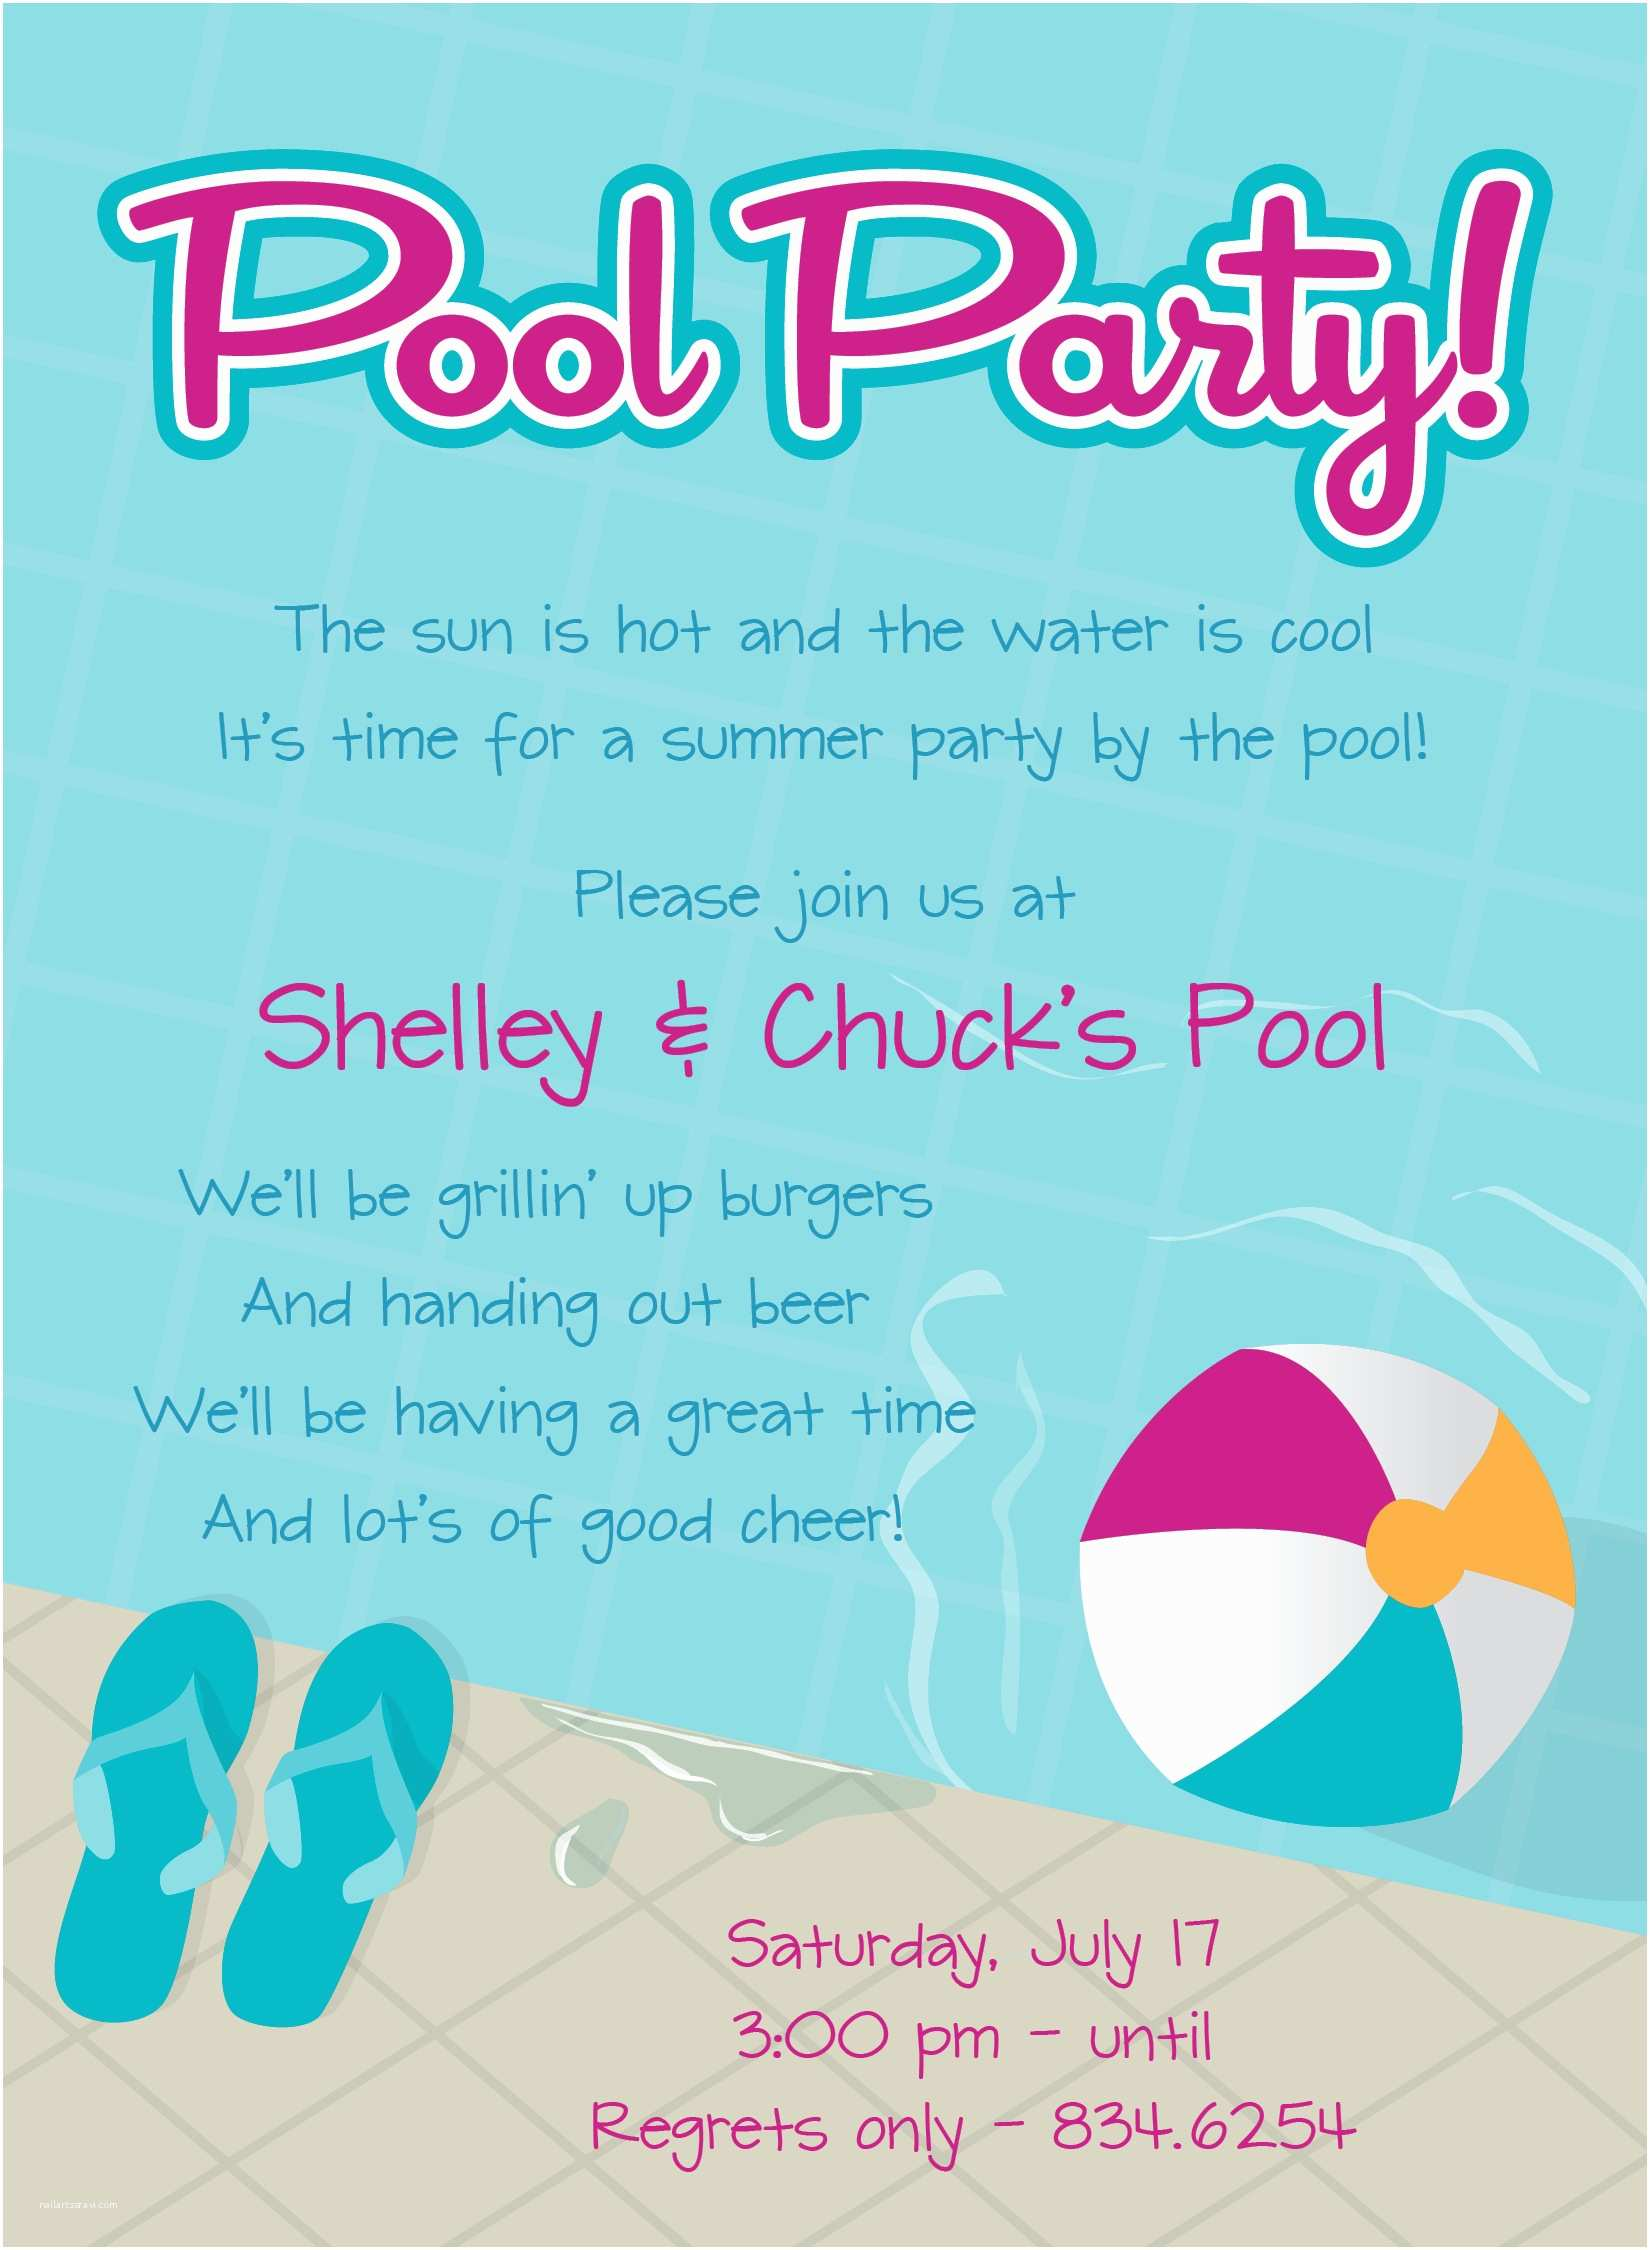 Pool Party Invitation Ideas Pool Party Invitation Wording